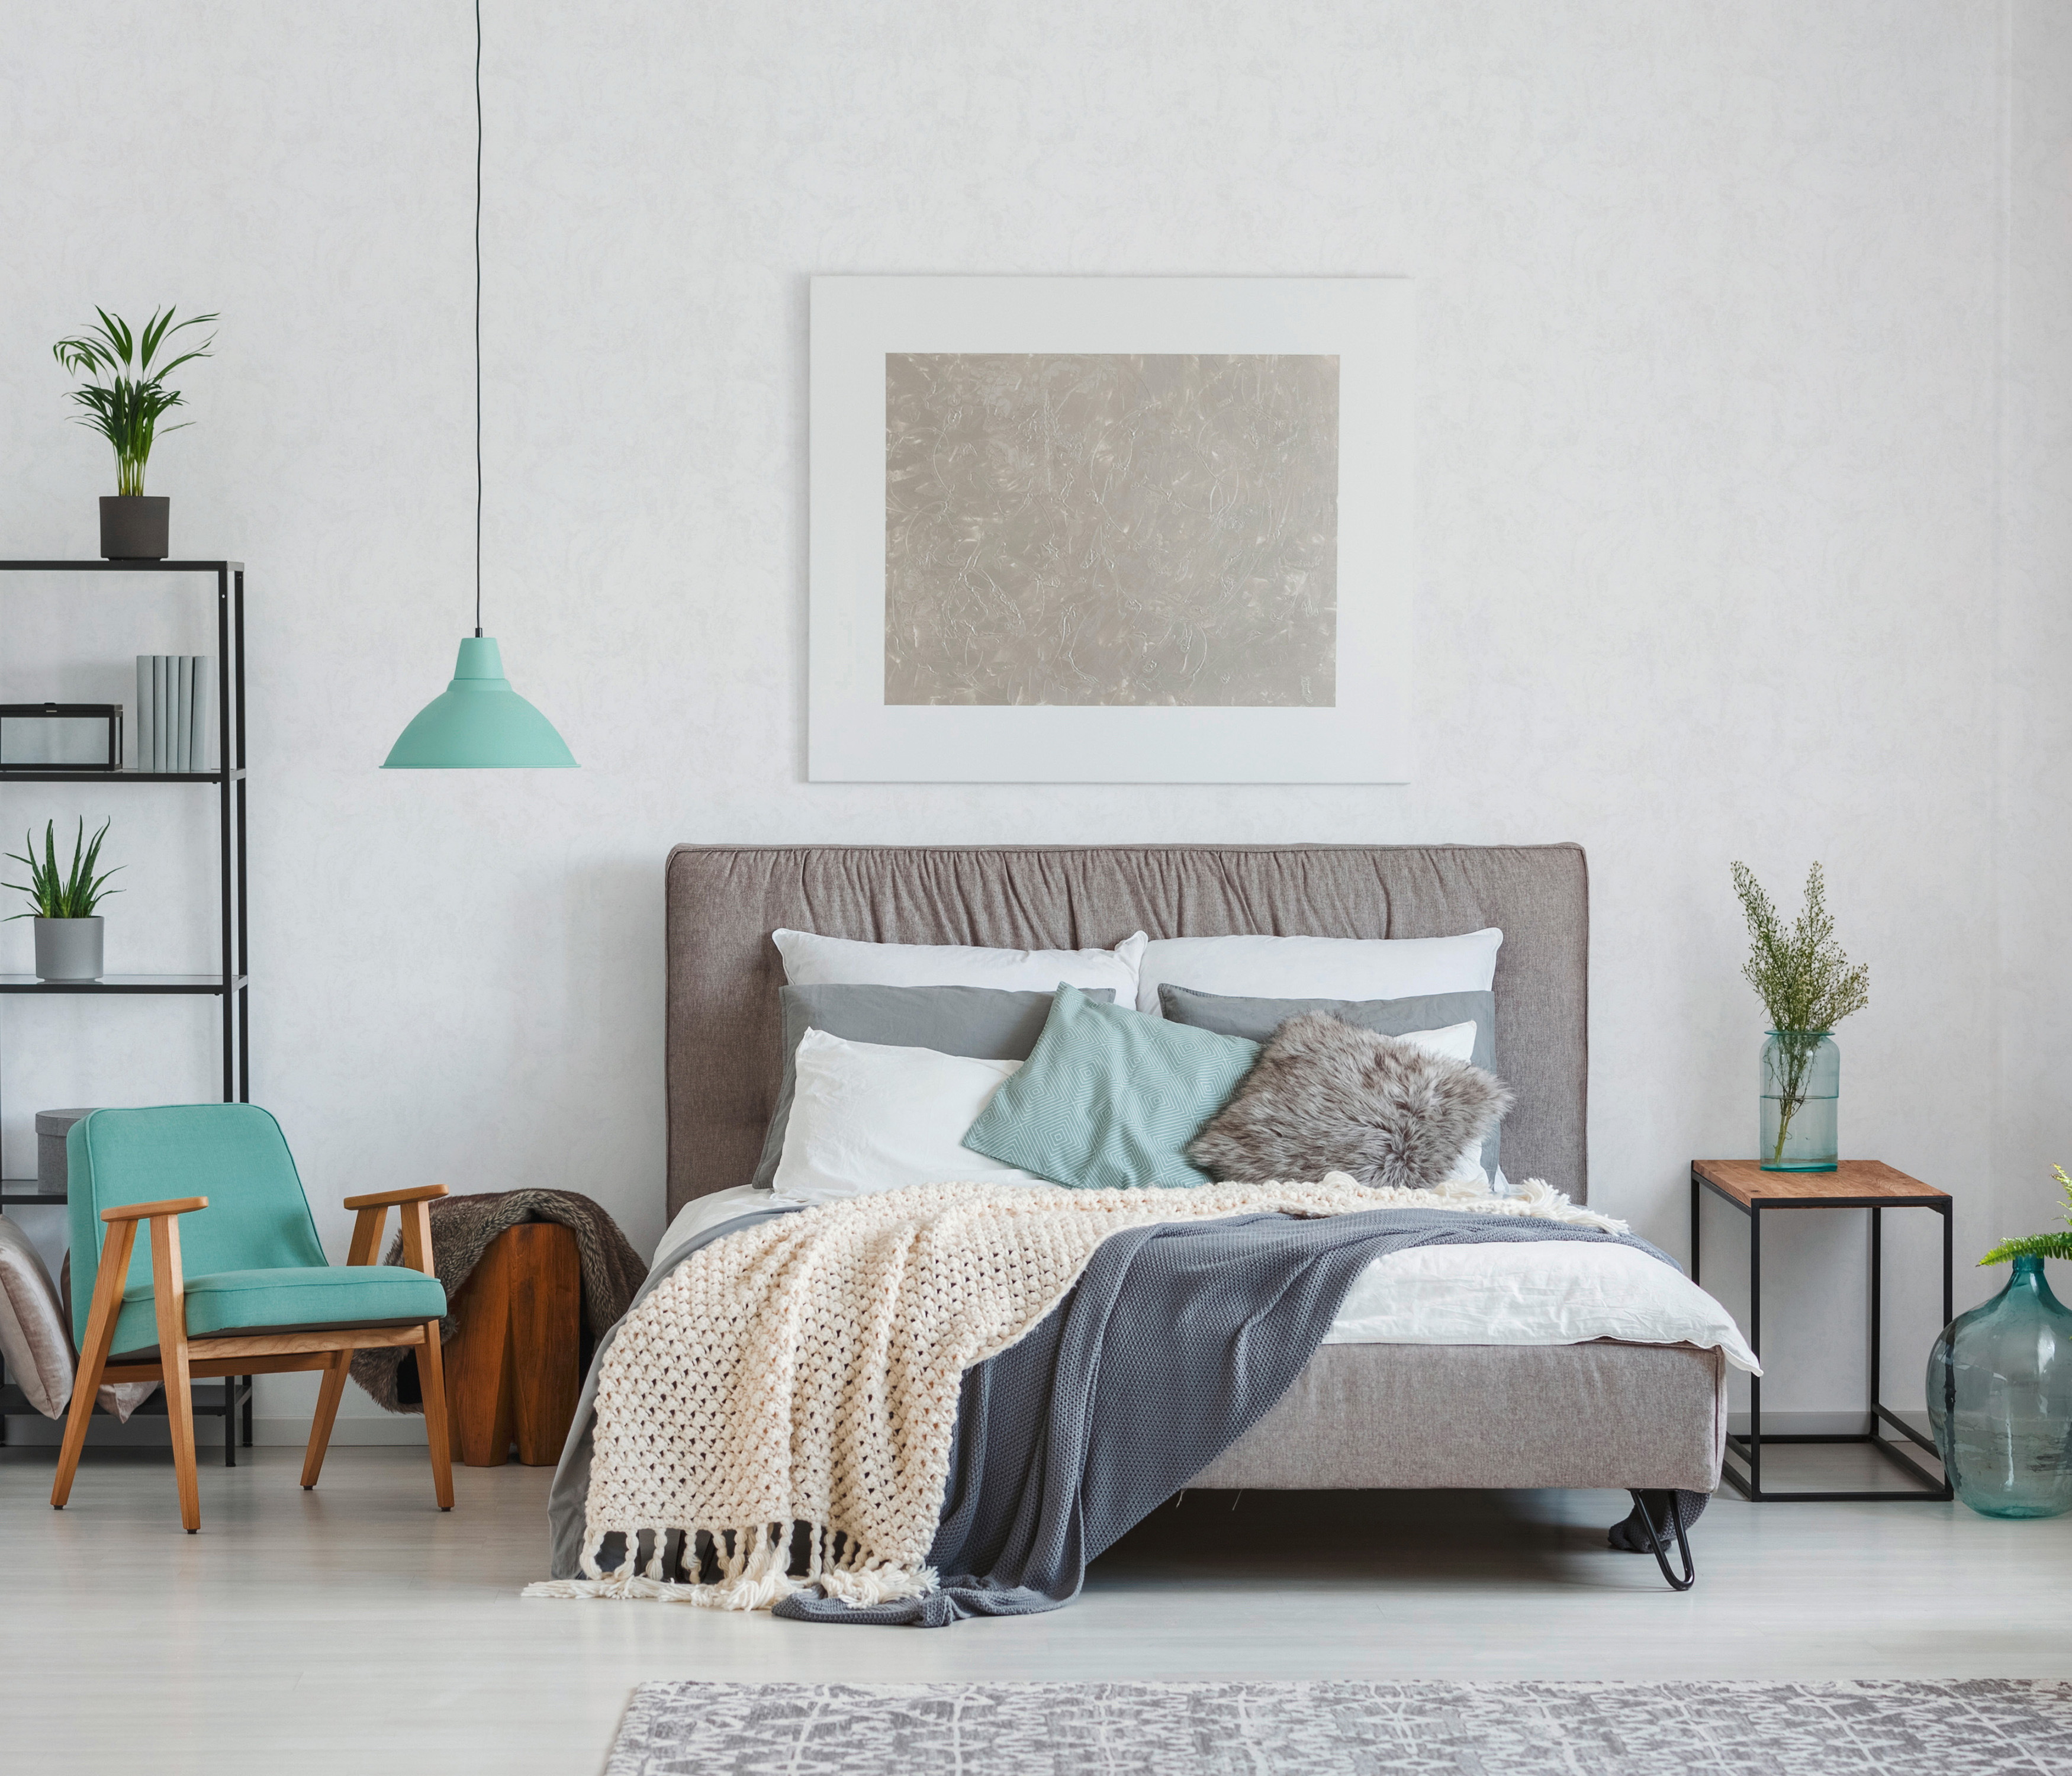 Vliestapete grau Schlafzimmer